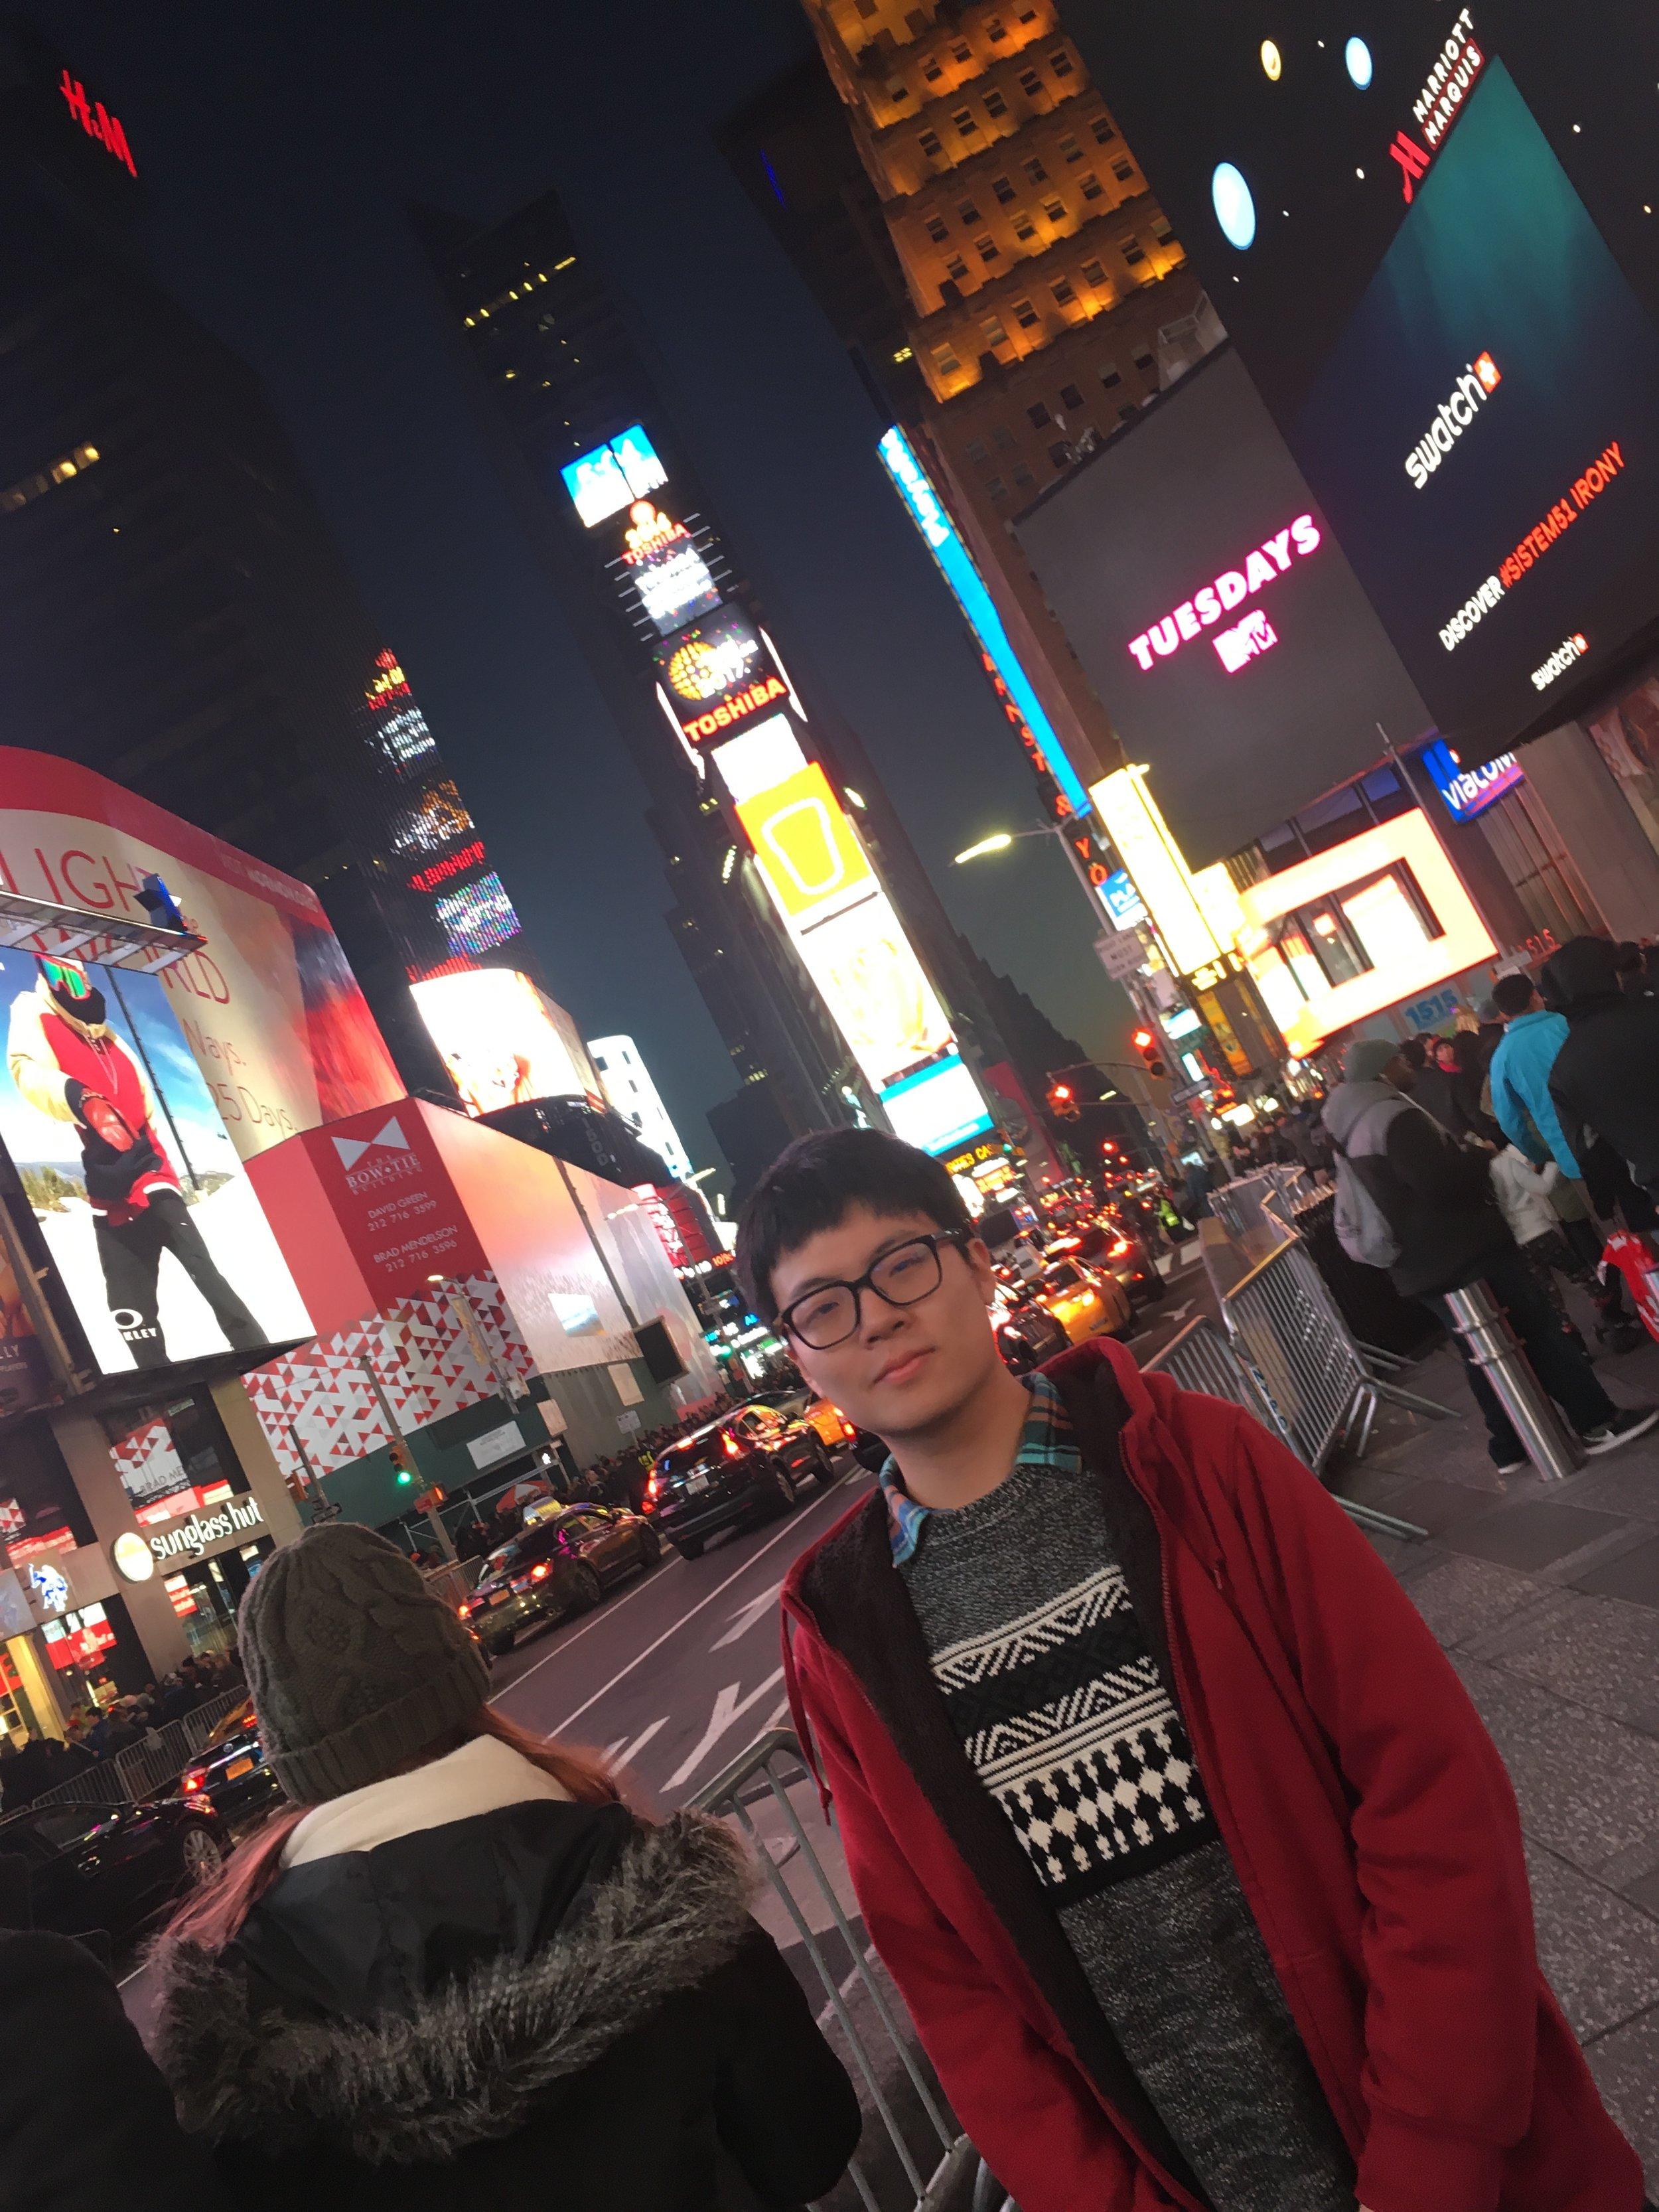 In Time Square, NY